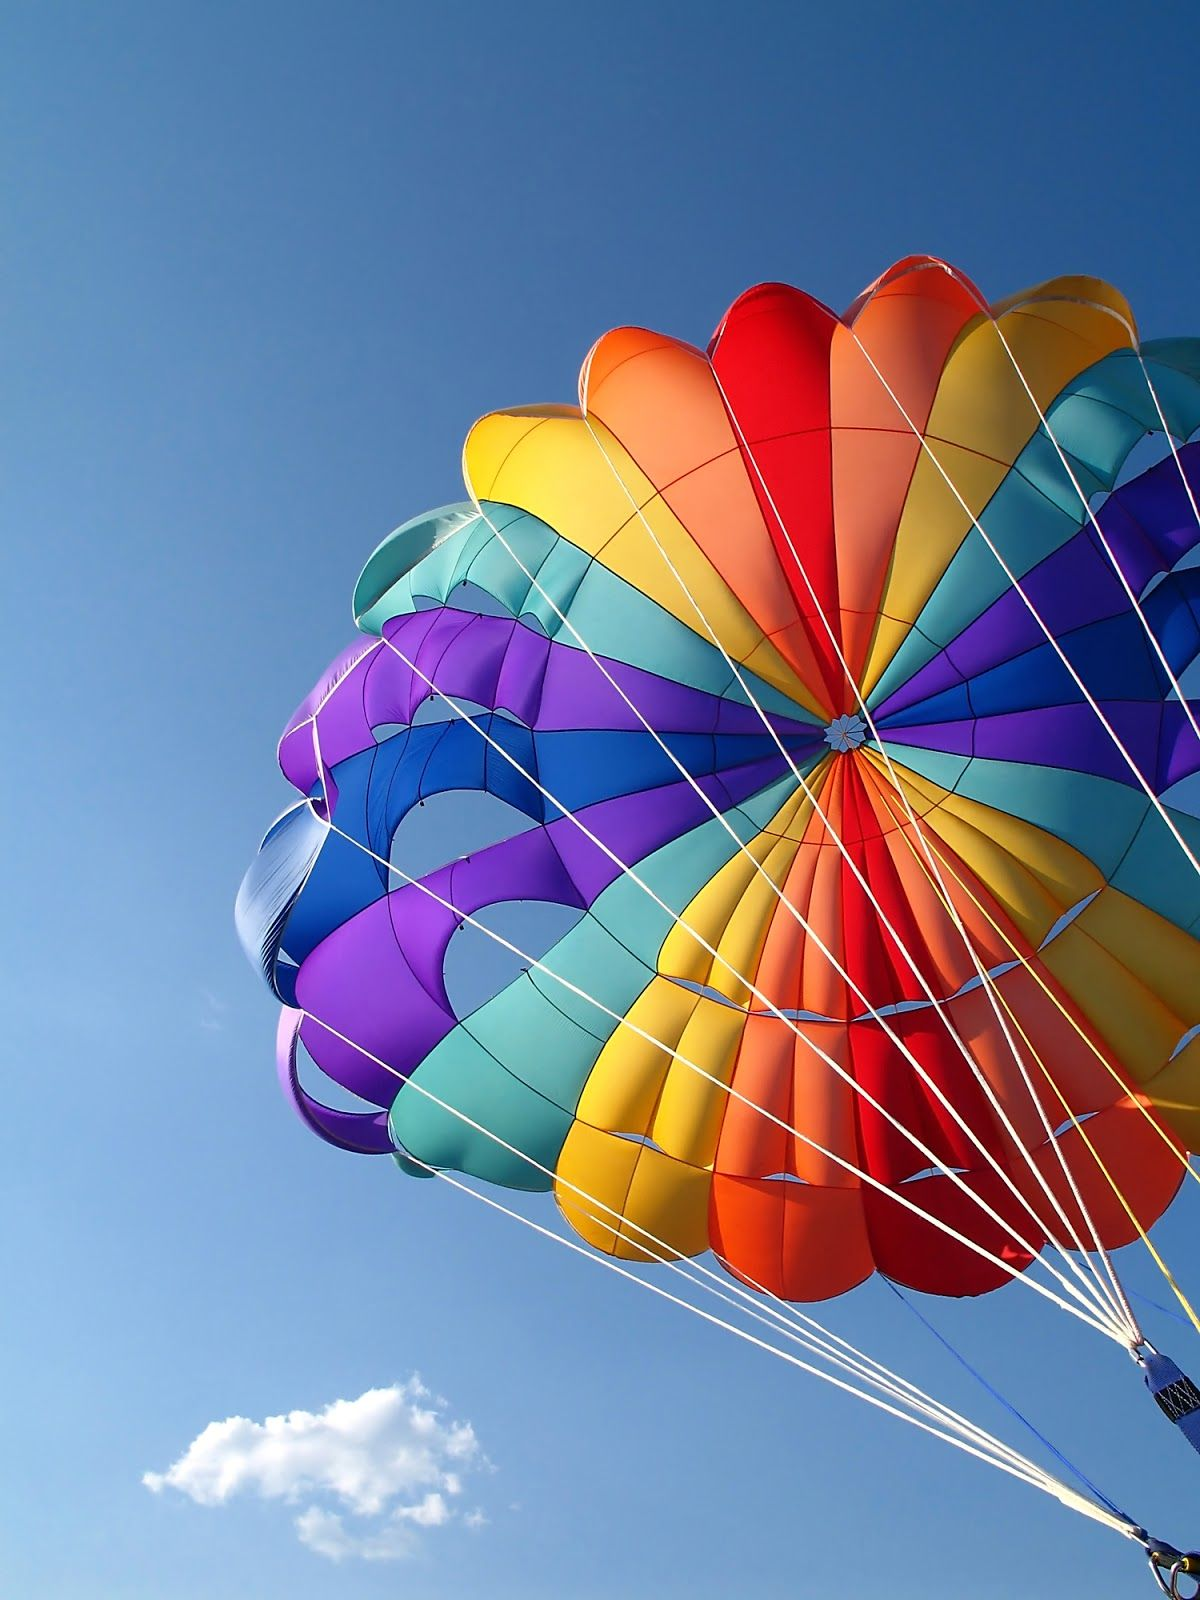 Idem na tooooooooo!!! :D  http://www.hurricanefactory.com/tatralandia/sk/novinky/ako-sa-co-najlepsie-pripravit-na-zoskok-z-lietadla